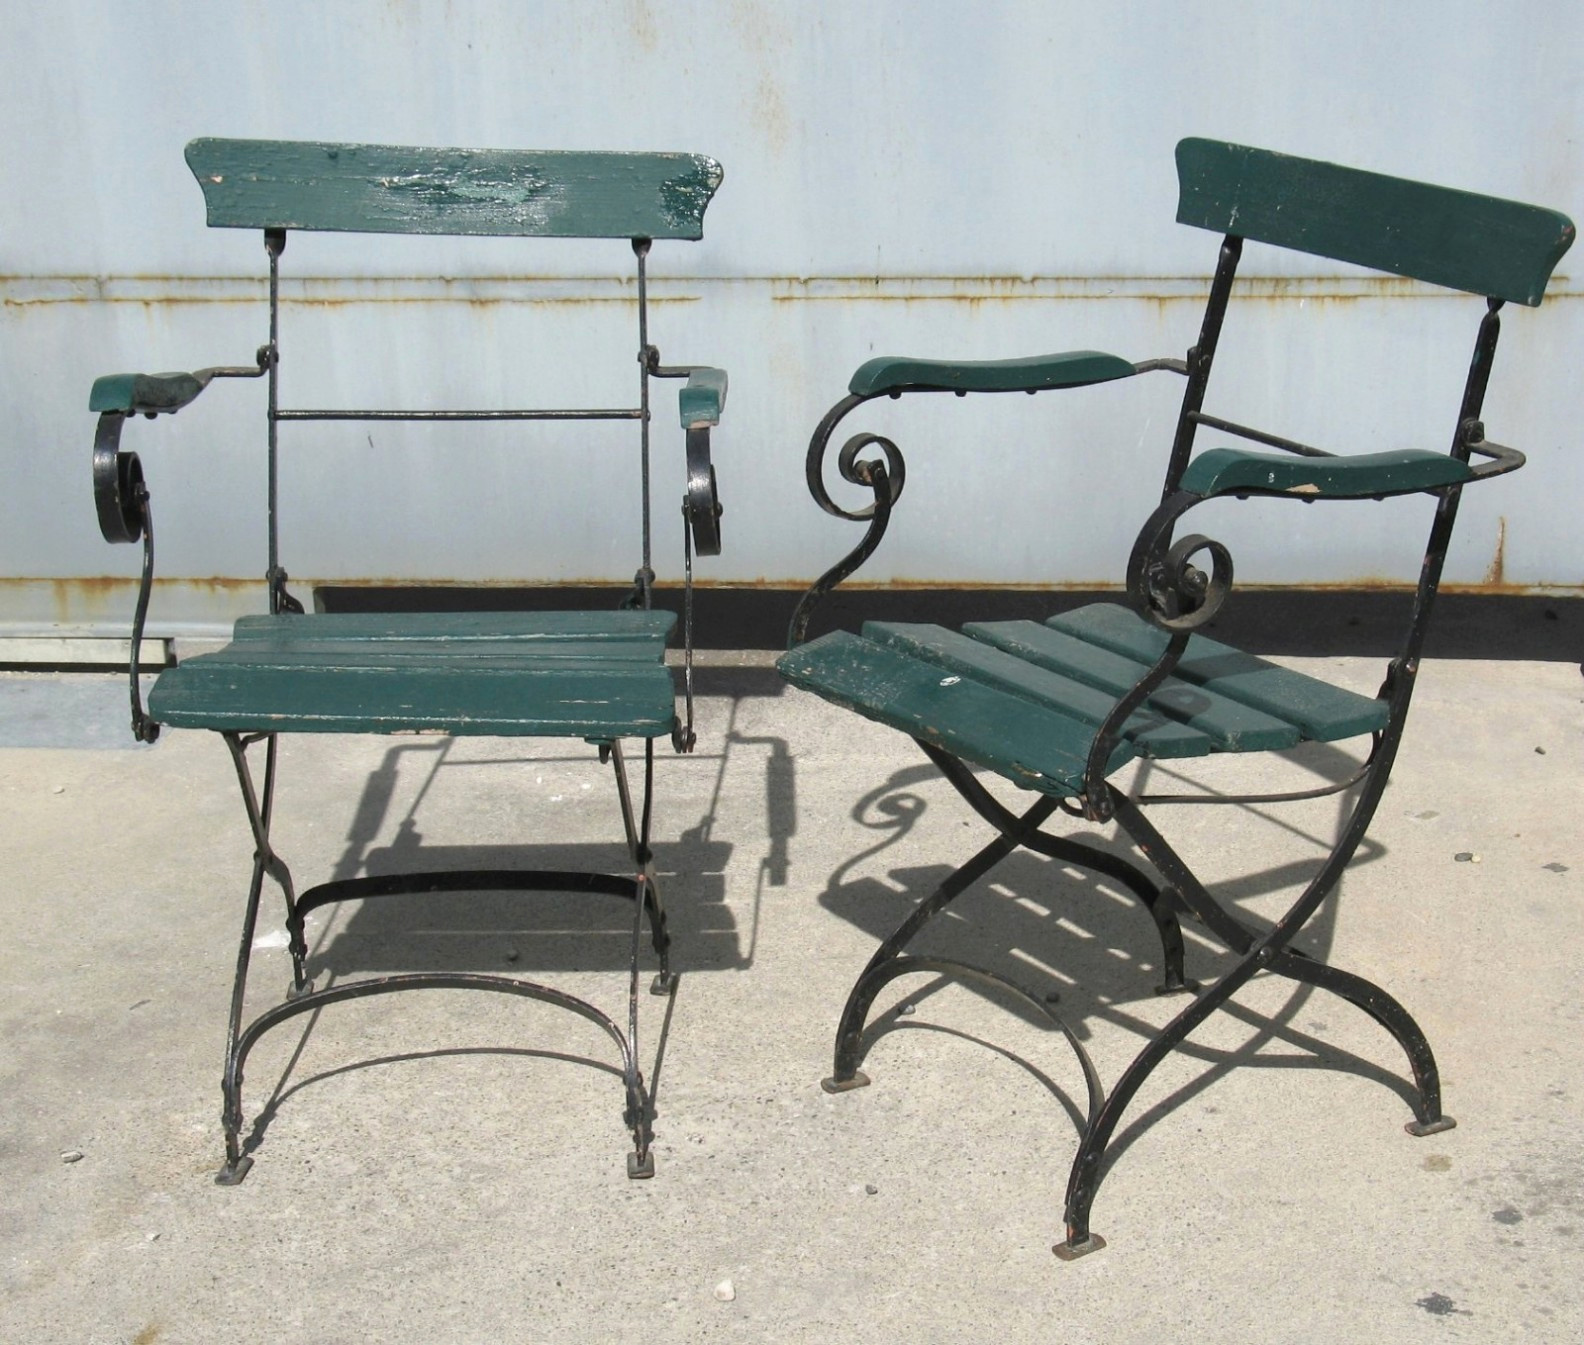 table et chaise de jardin en aluminium charmant ensemble table et chaise de jardin aluminium table basse de jardin of table et chaise de jardin en aluminium